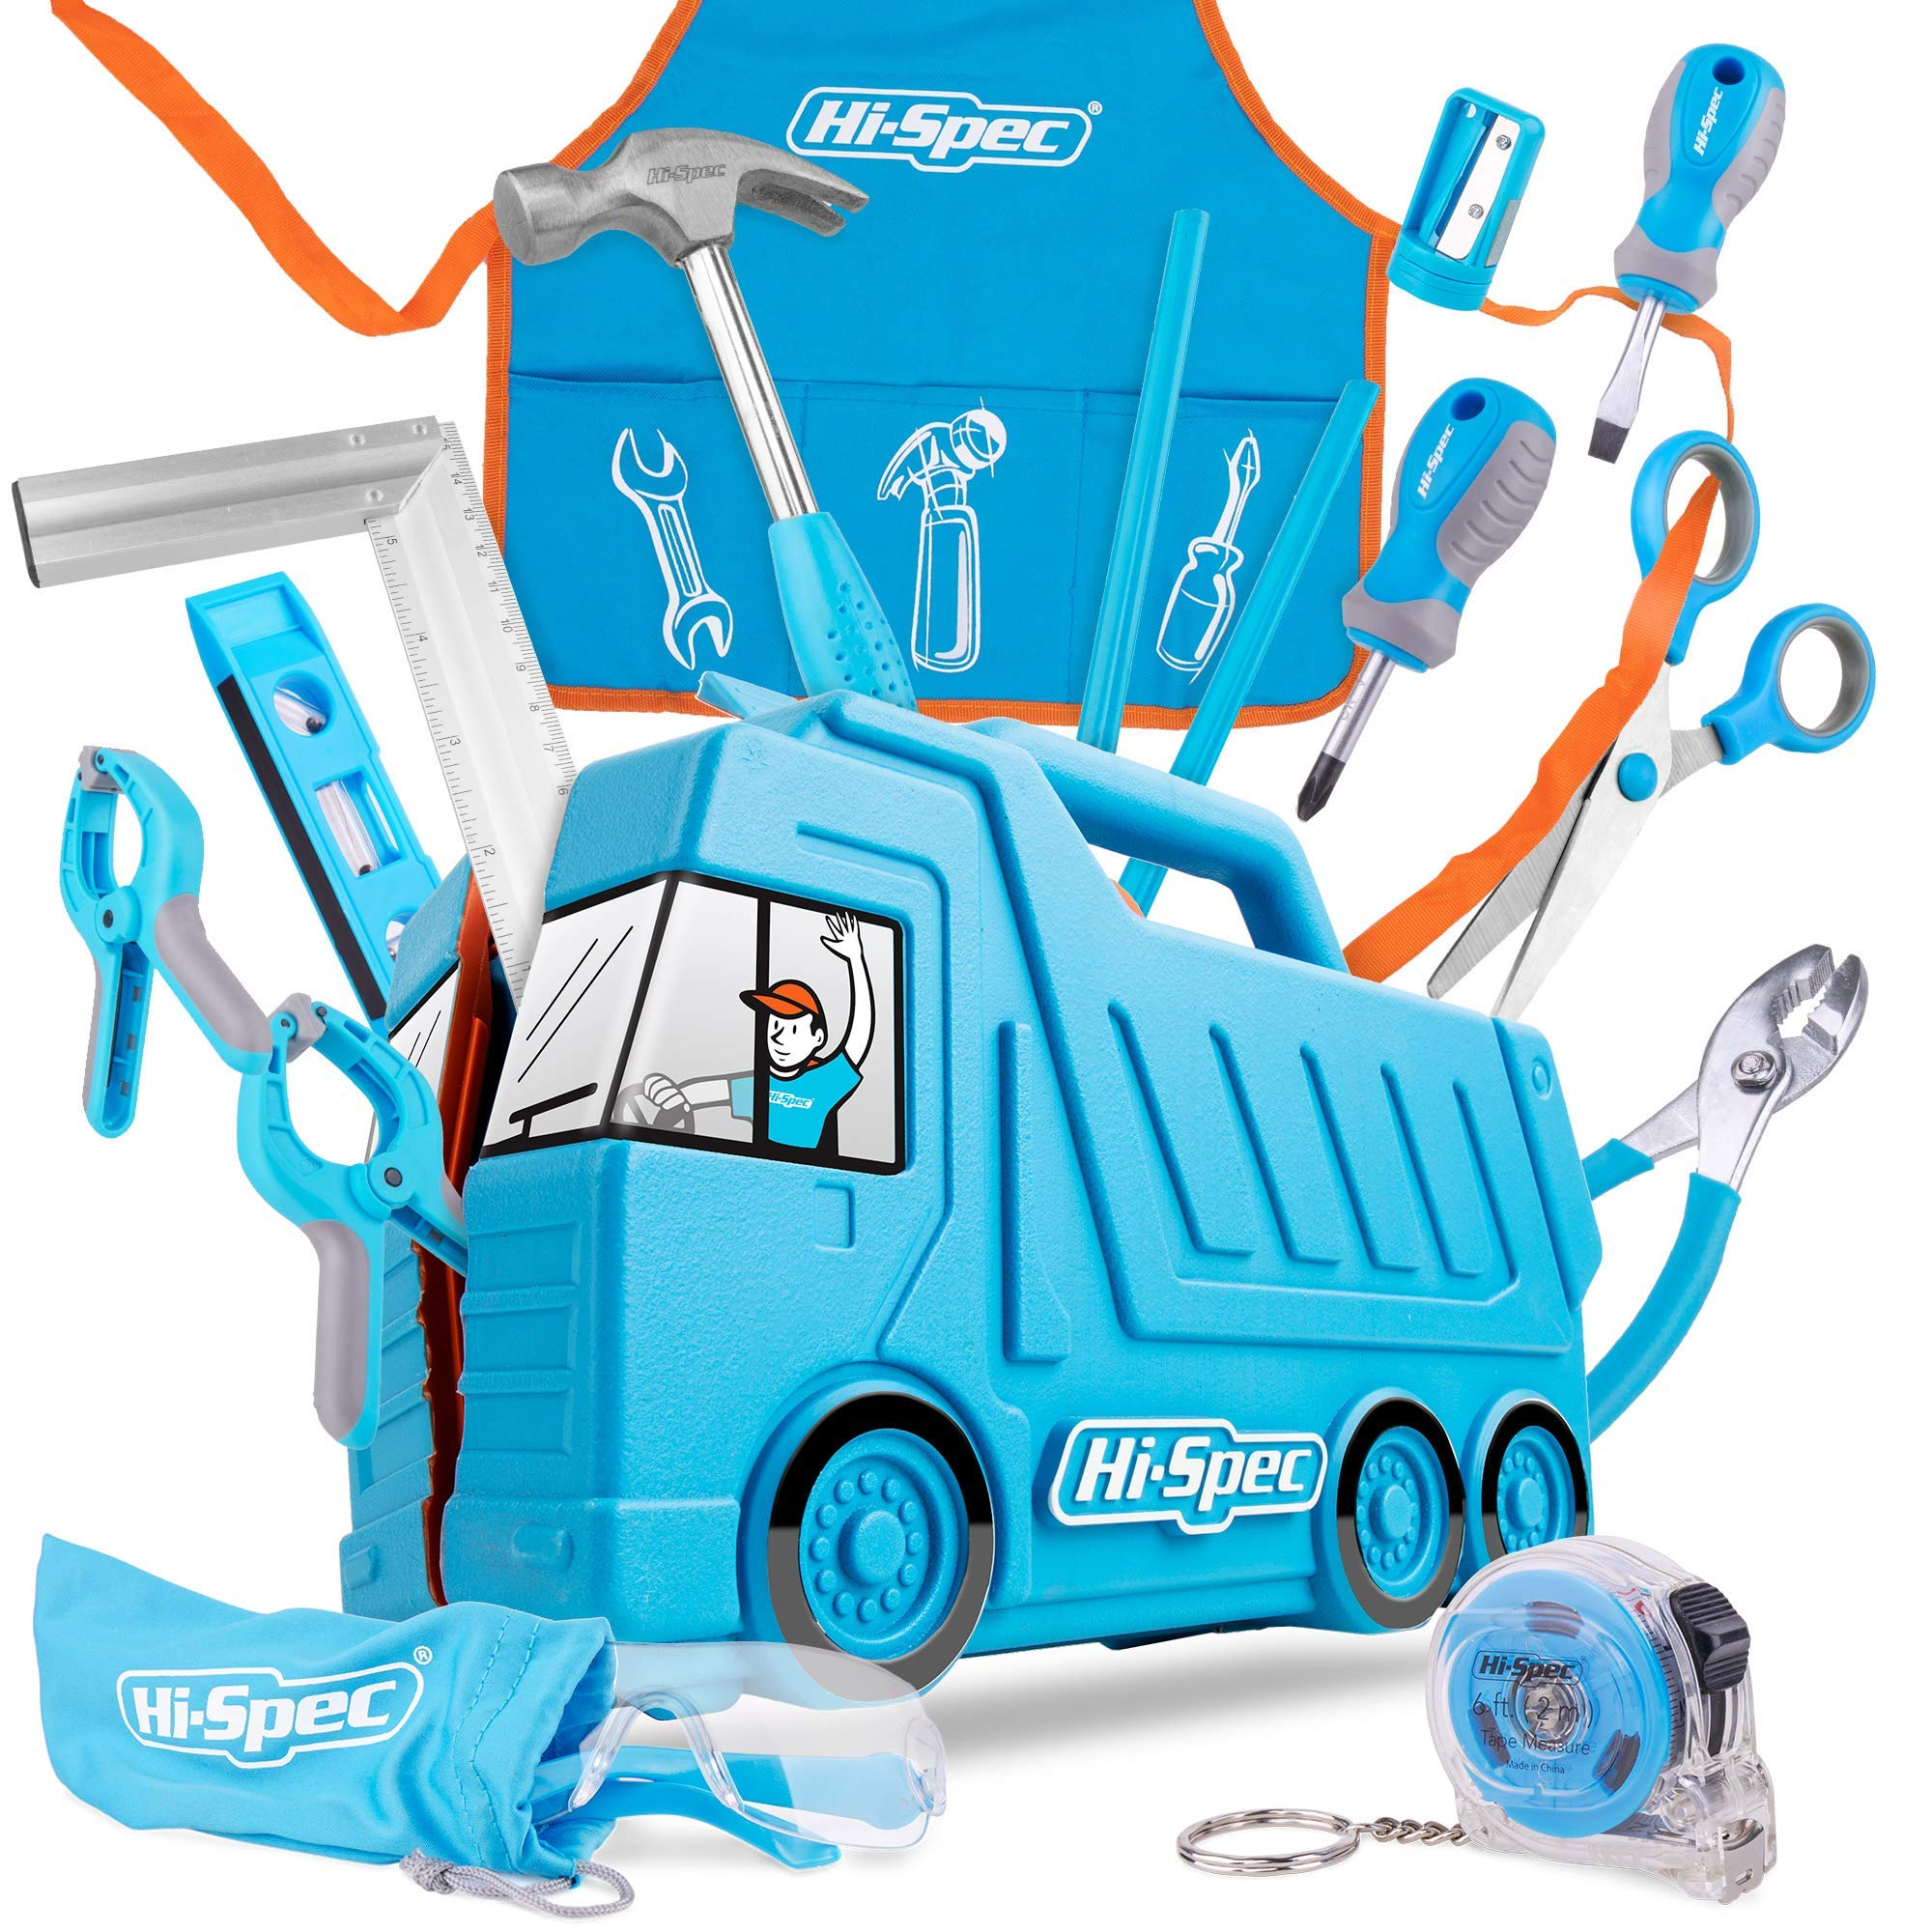 Hi Spec Scissors Construction Educational Childrens